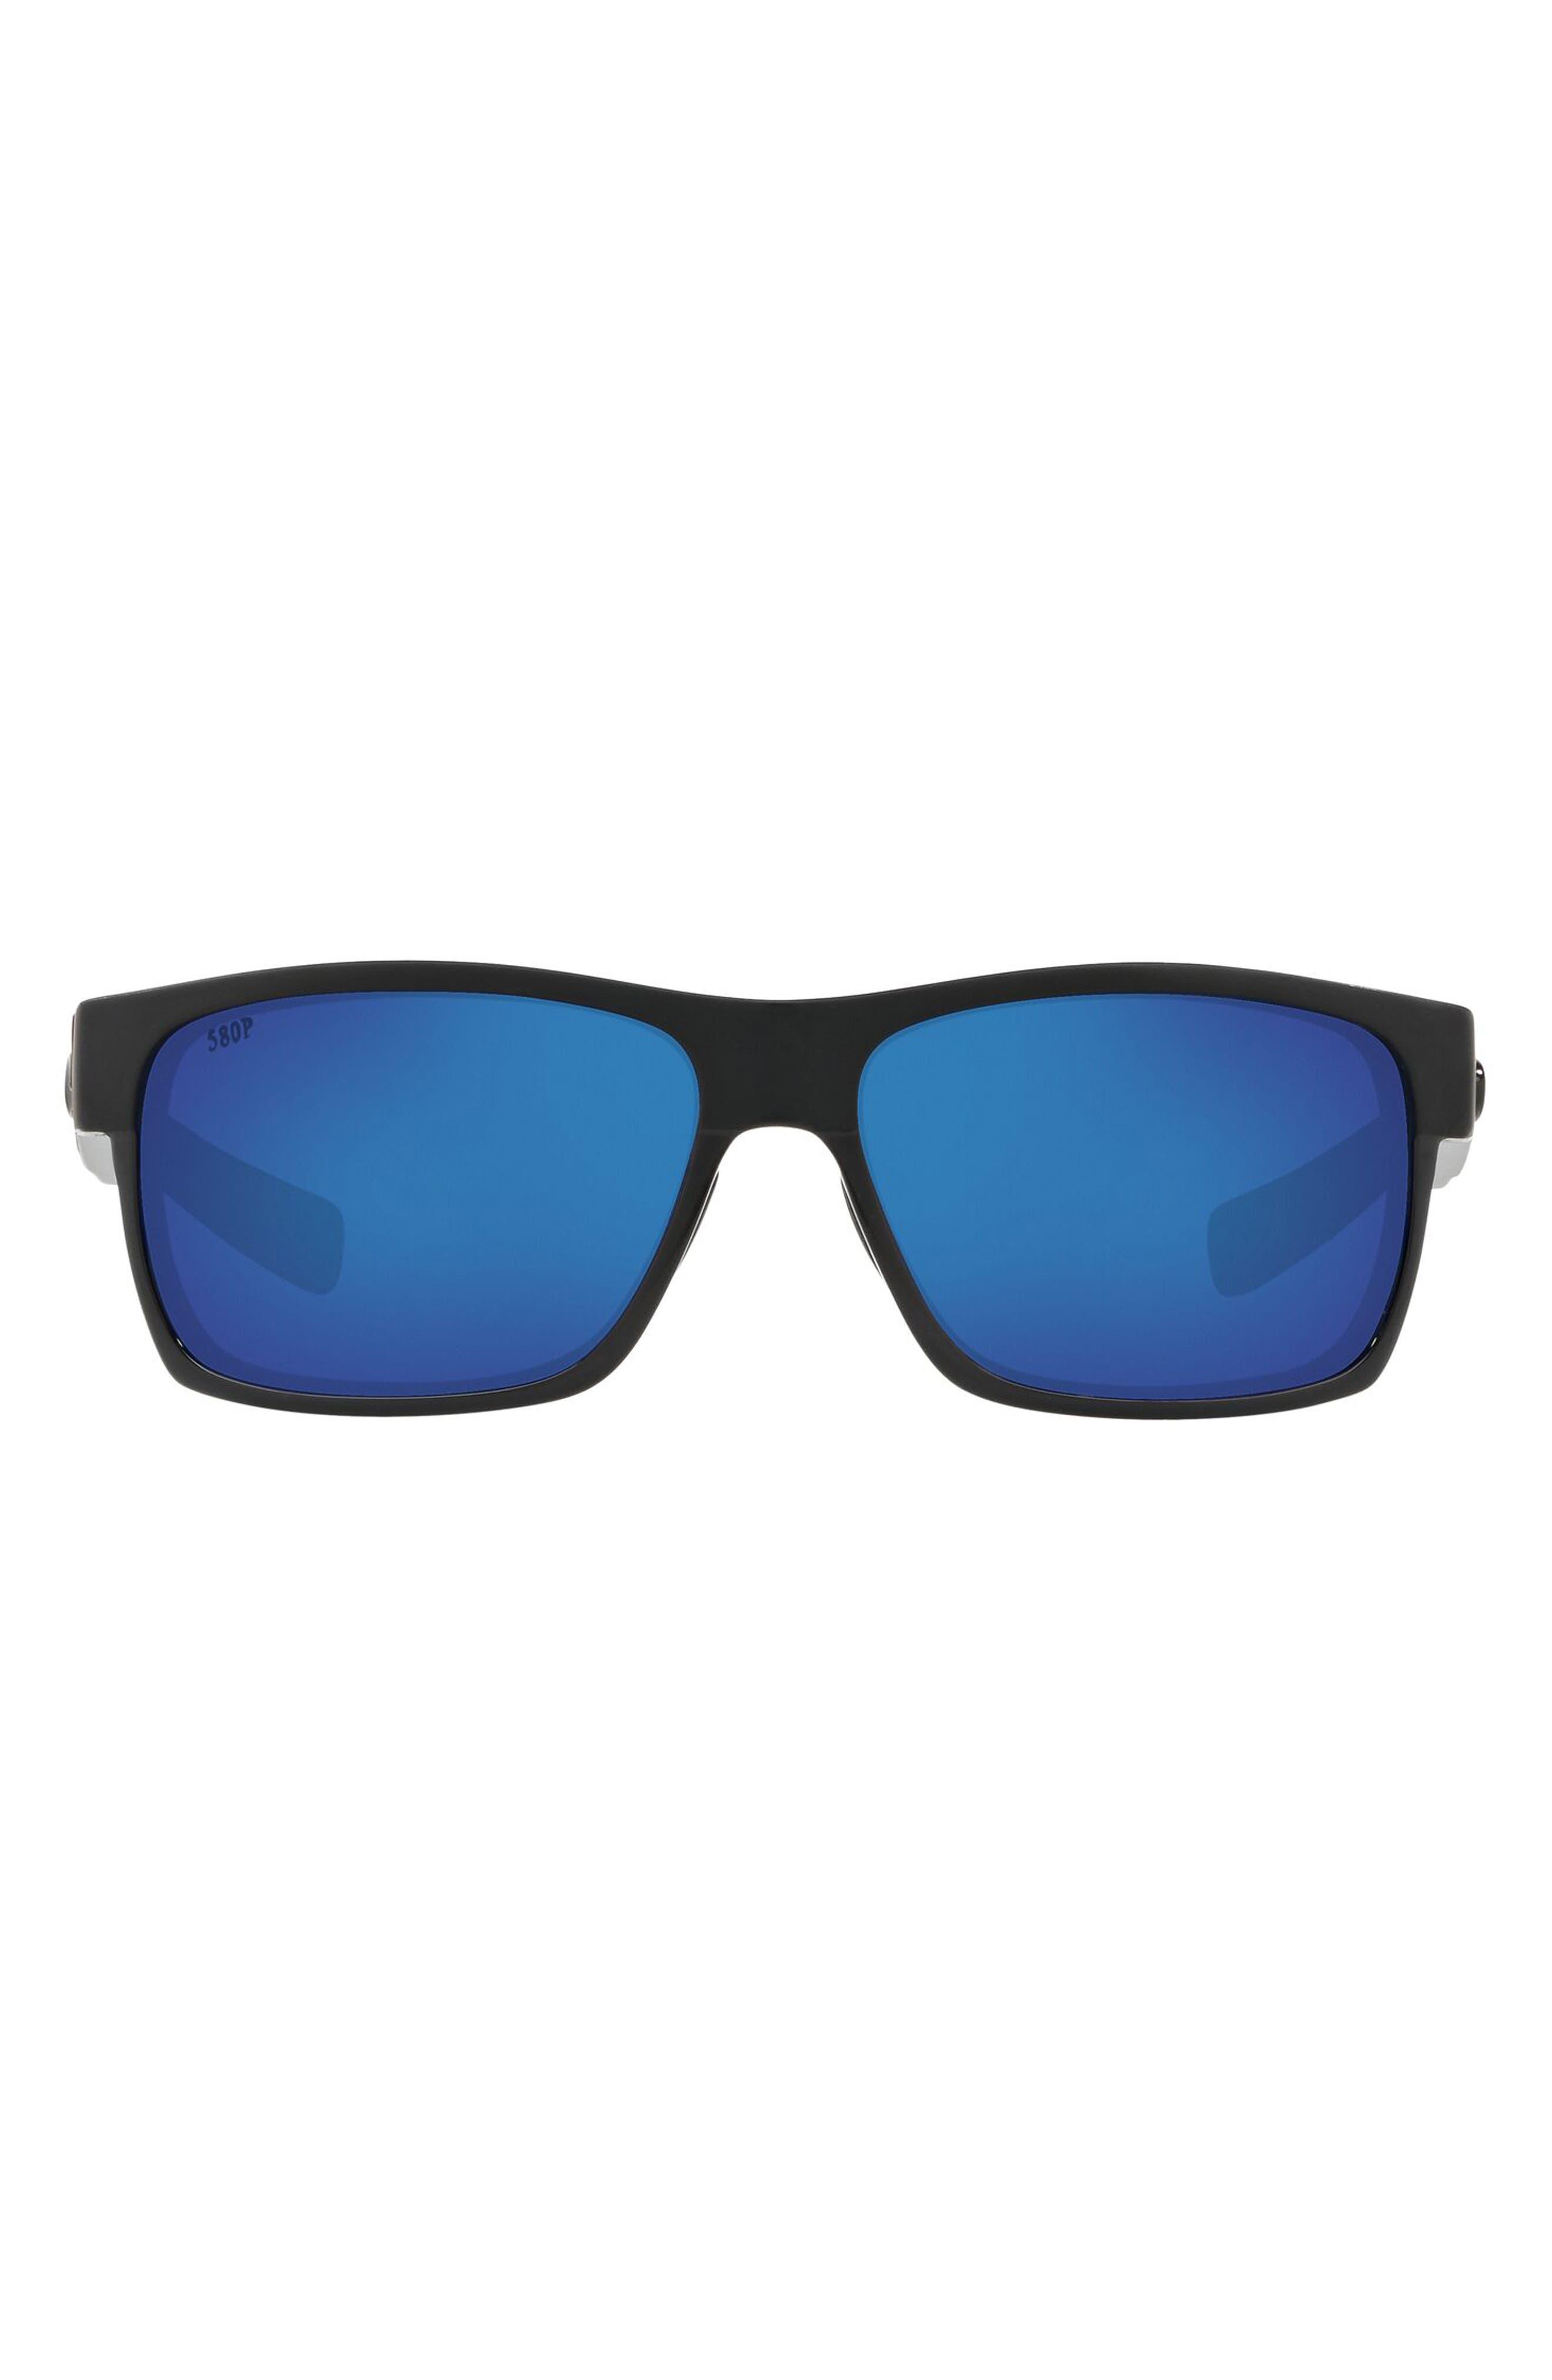 60mm Polarized Rectangular Sunglasses